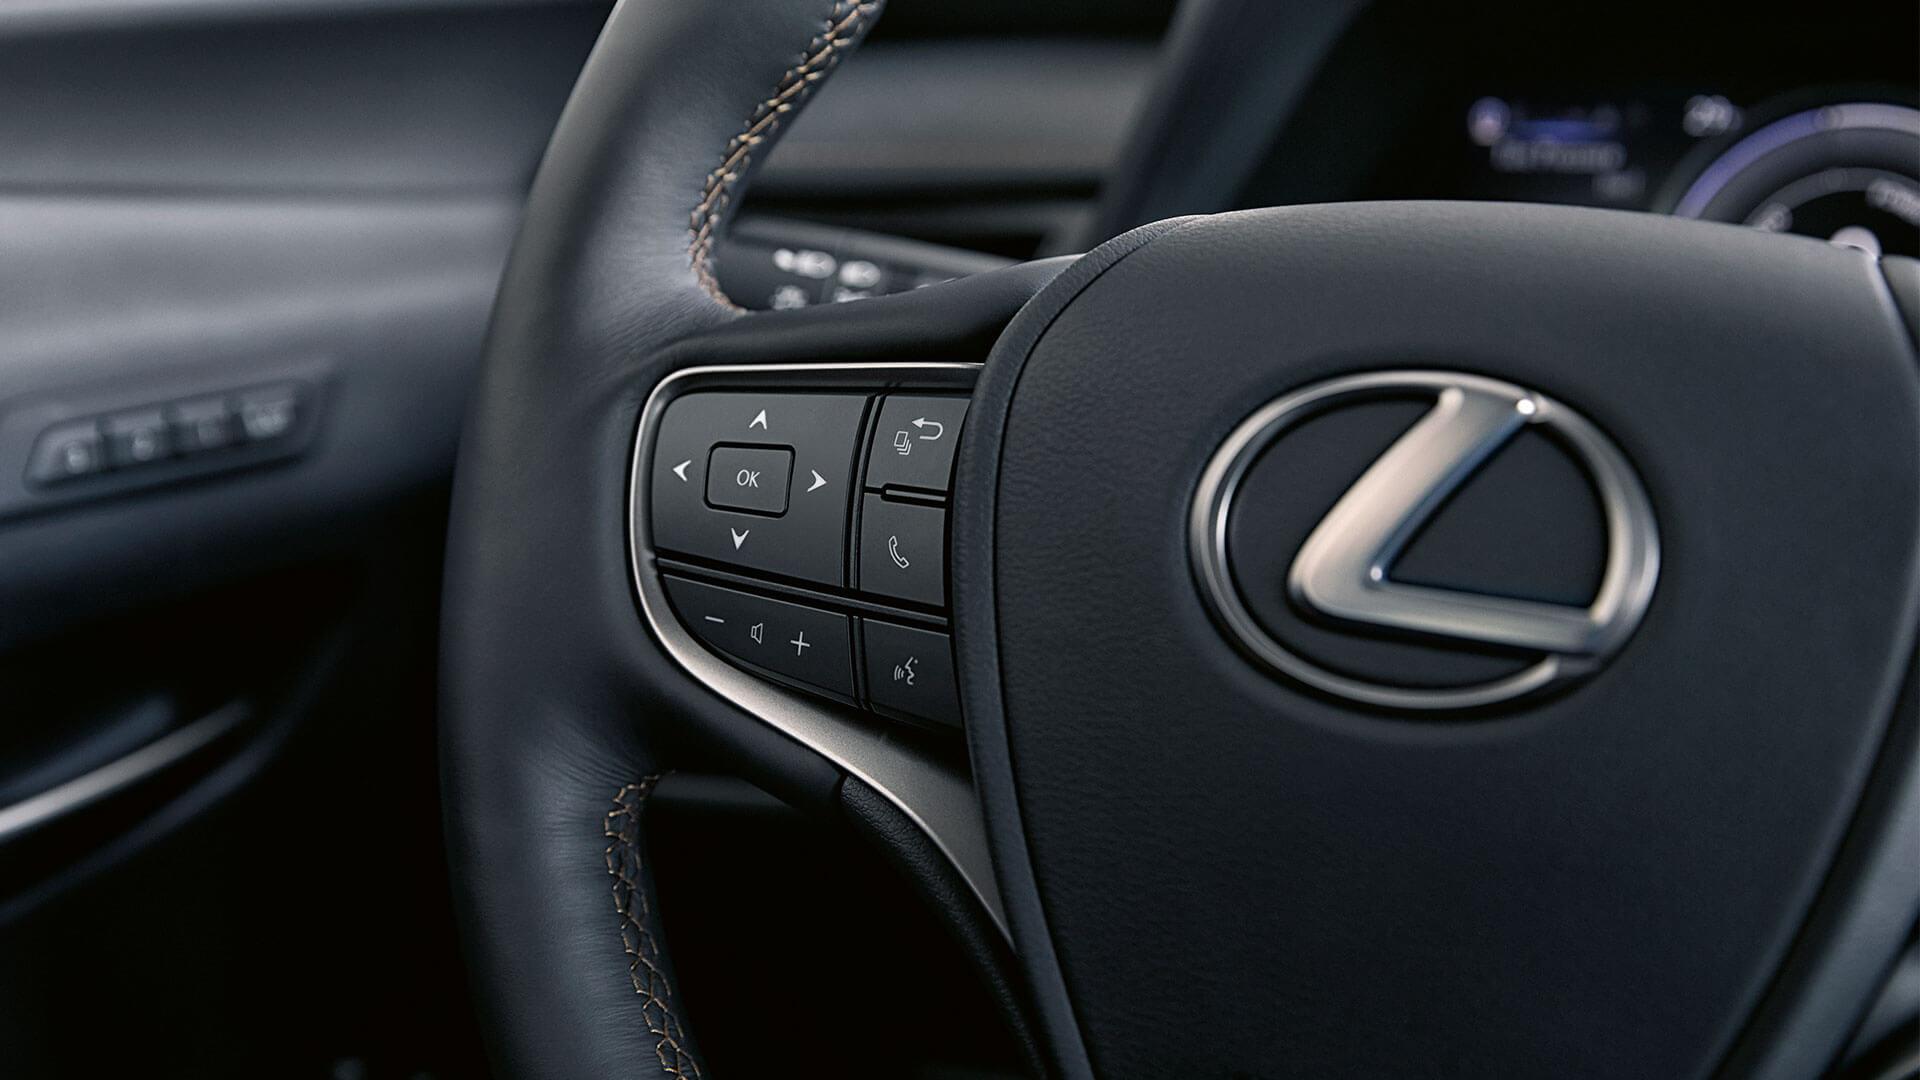 Lexus UX Lenkrad mit Funktionen Nahaufnahme